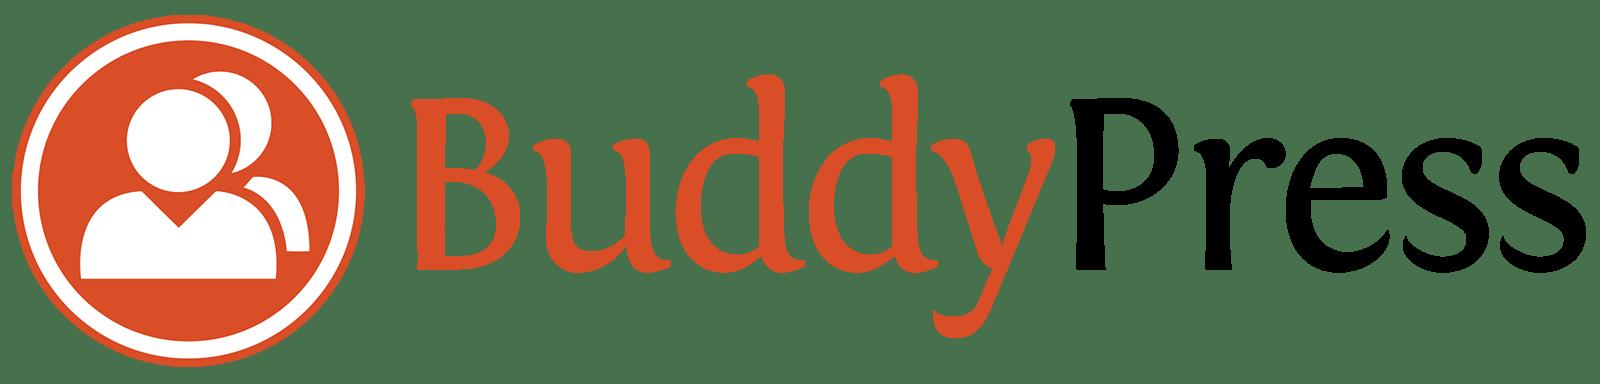 buddypress_logo